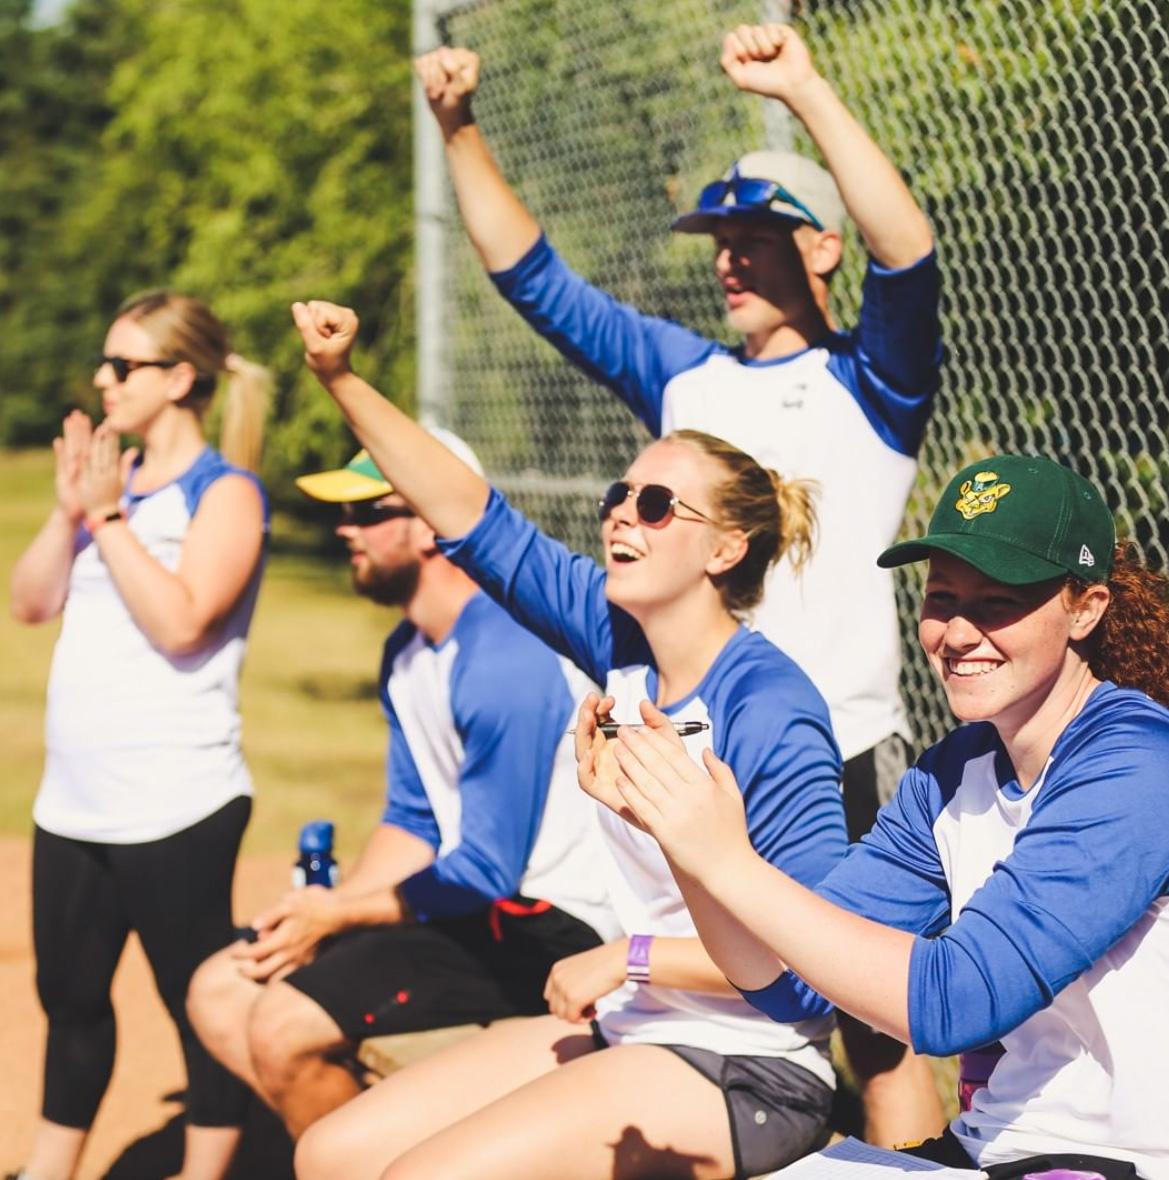 calgary sport and social club